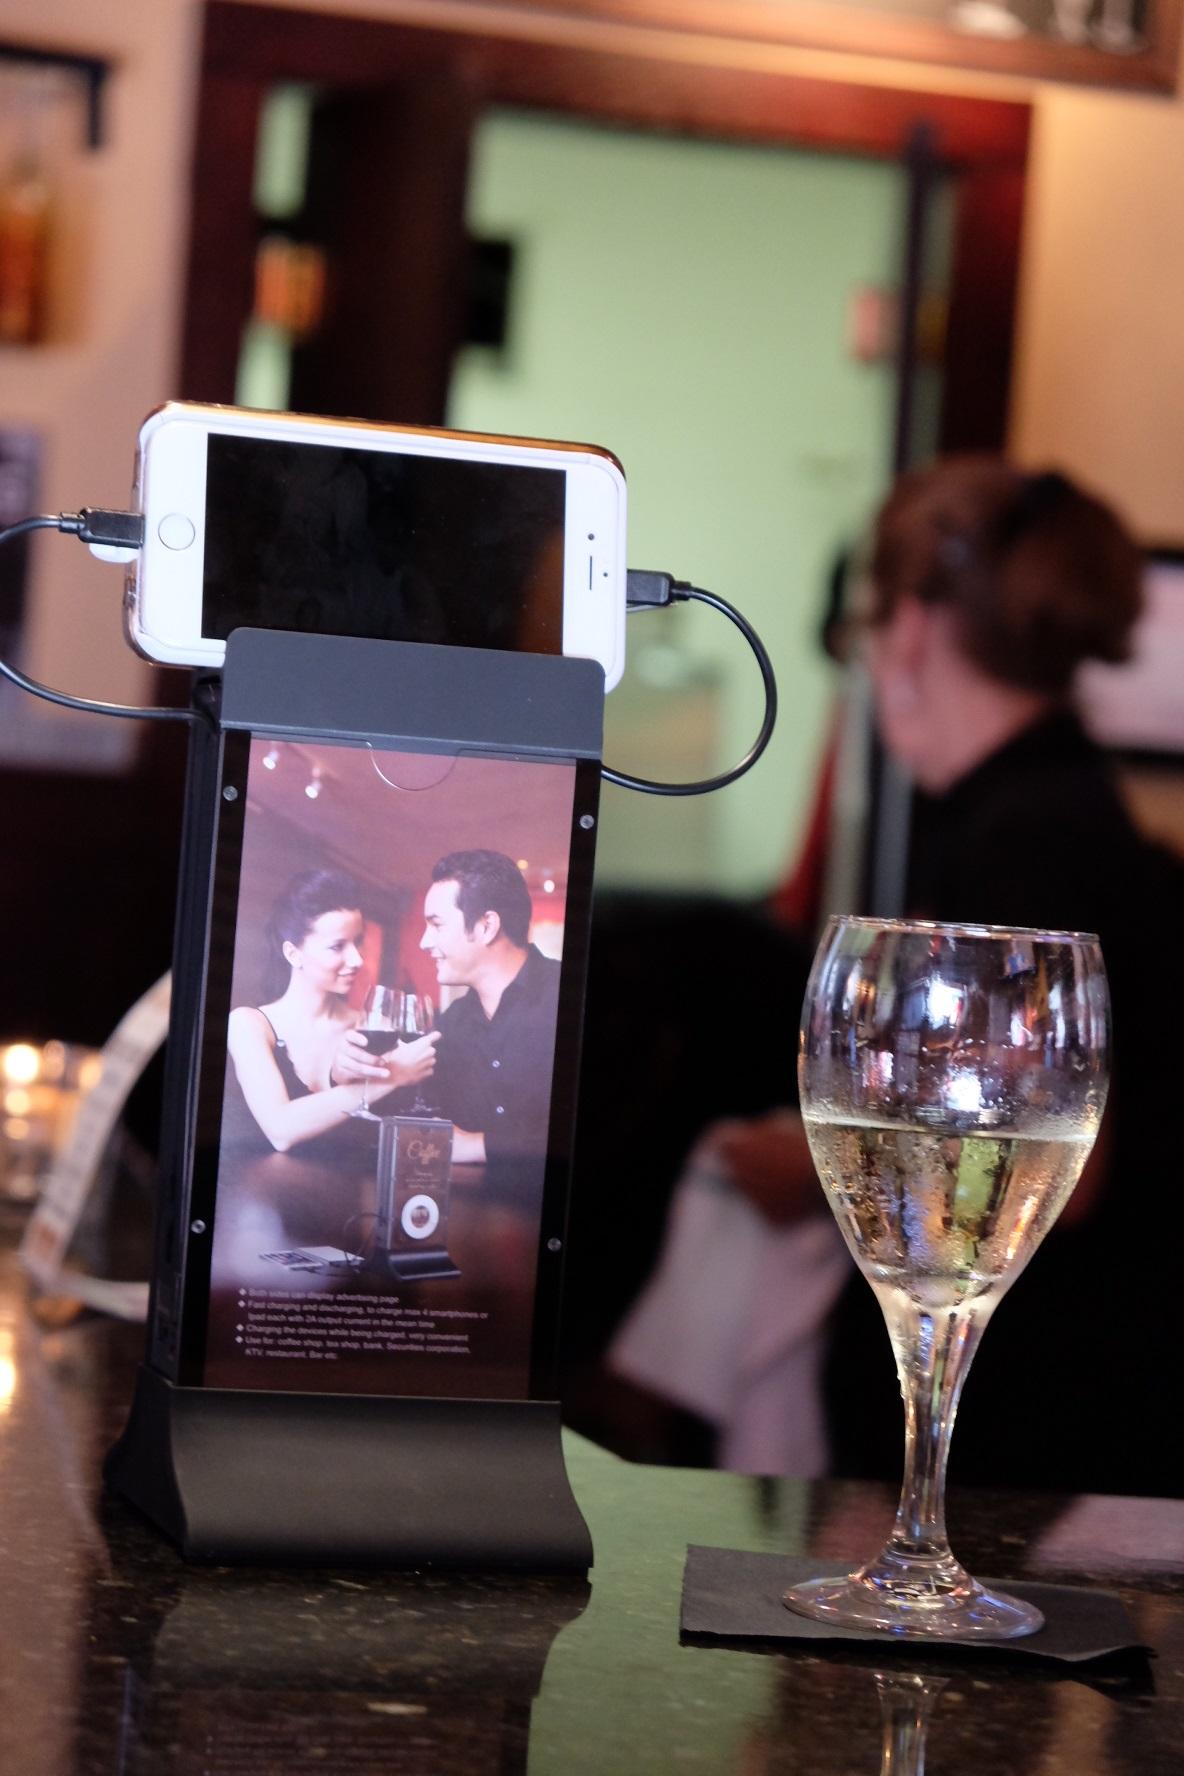 Table Tent Smartphone Power Station for Restaurants Bars